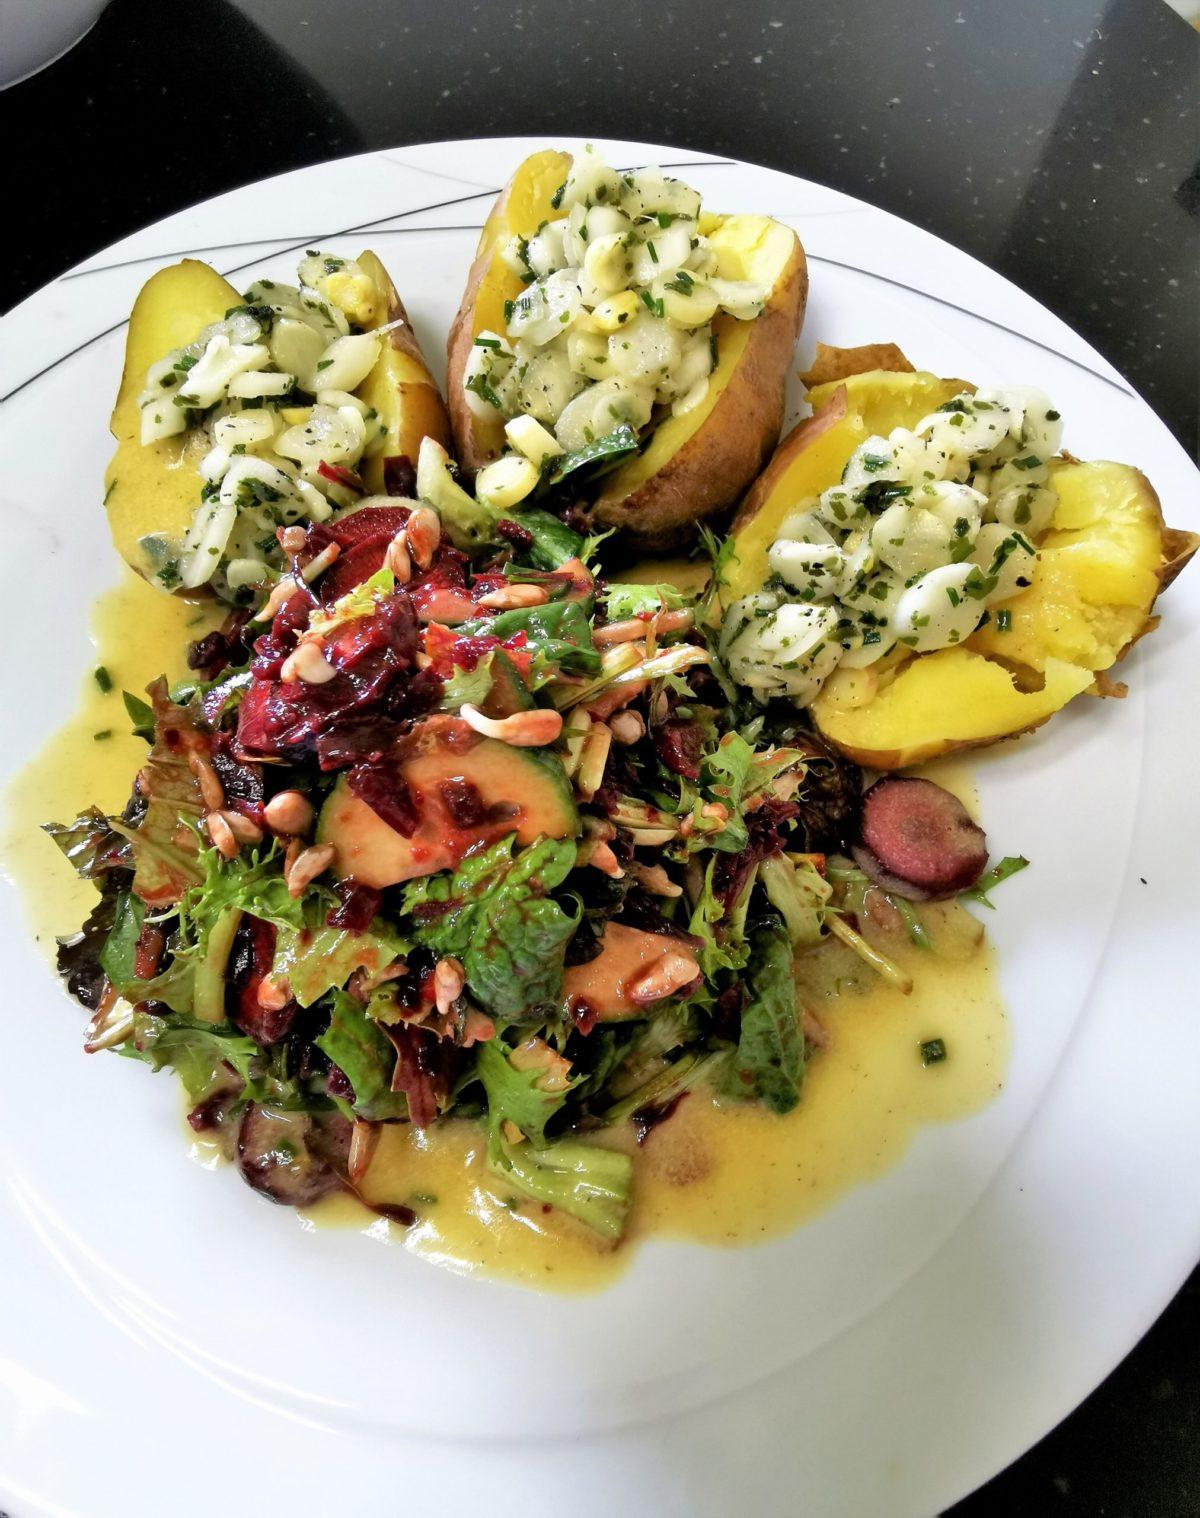 Rohkost Spargel Topping auf Salzkartoffeln mit Wildkräuter Salat